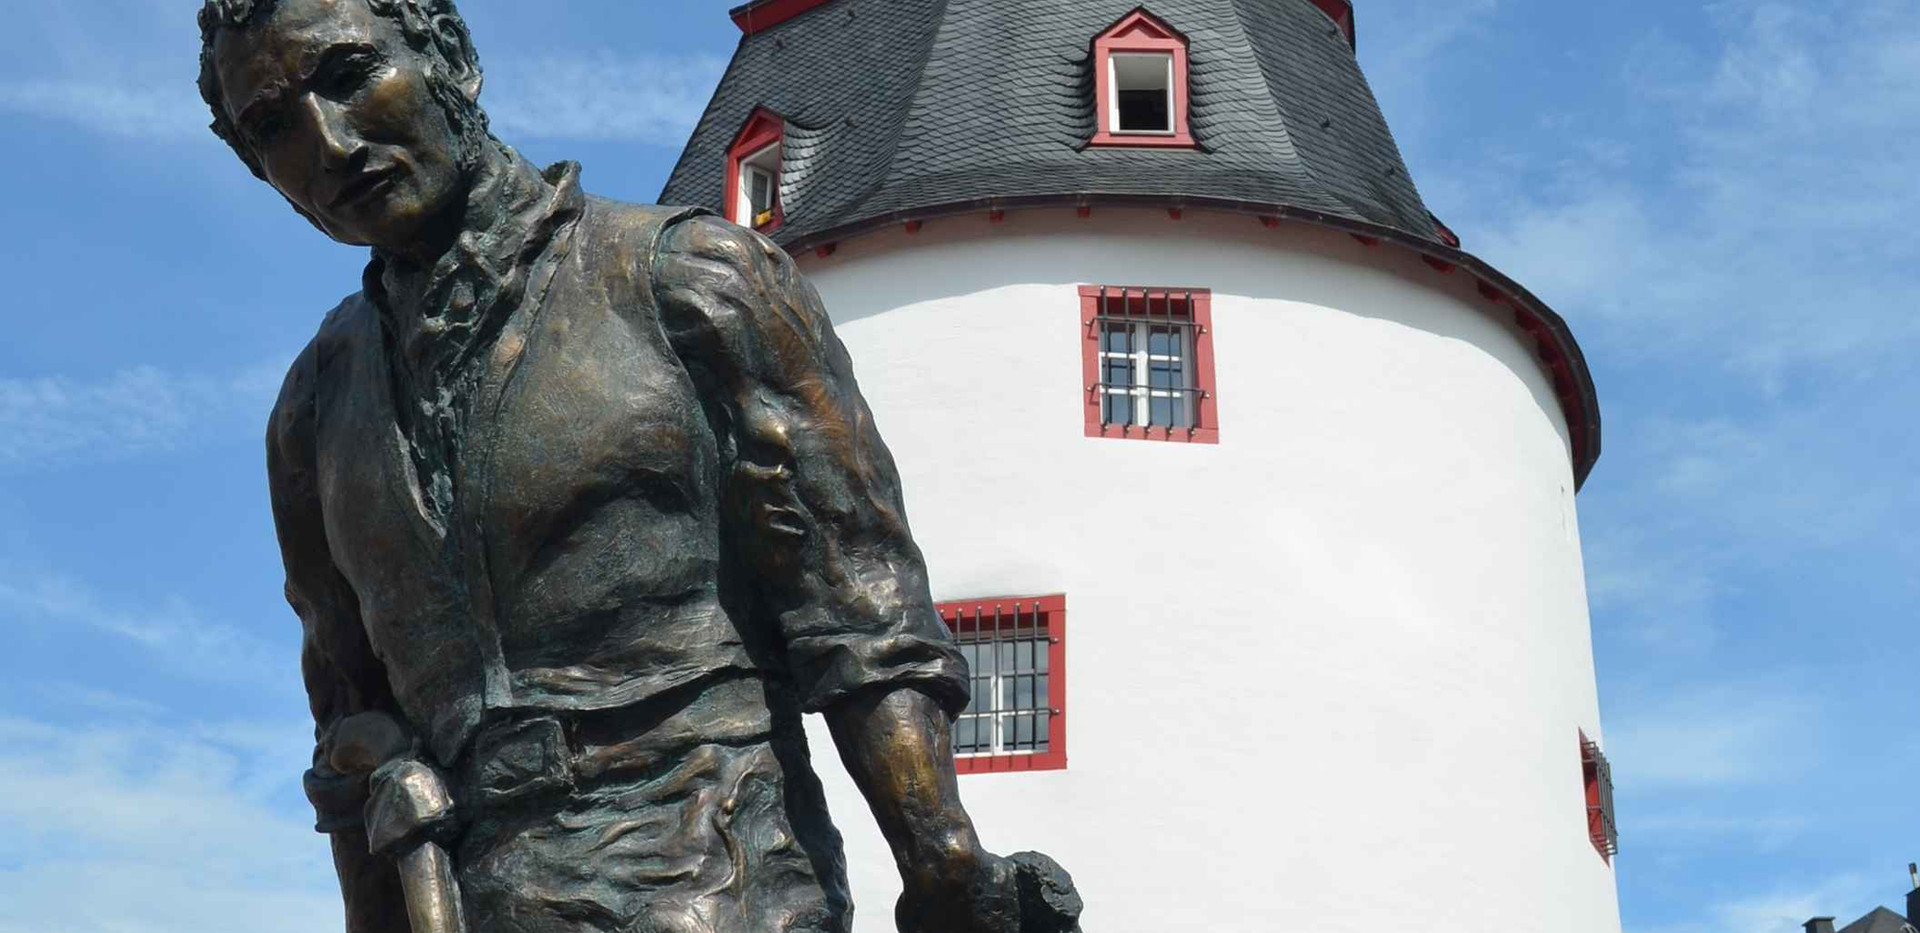 Skulptur in Simmern.jpg